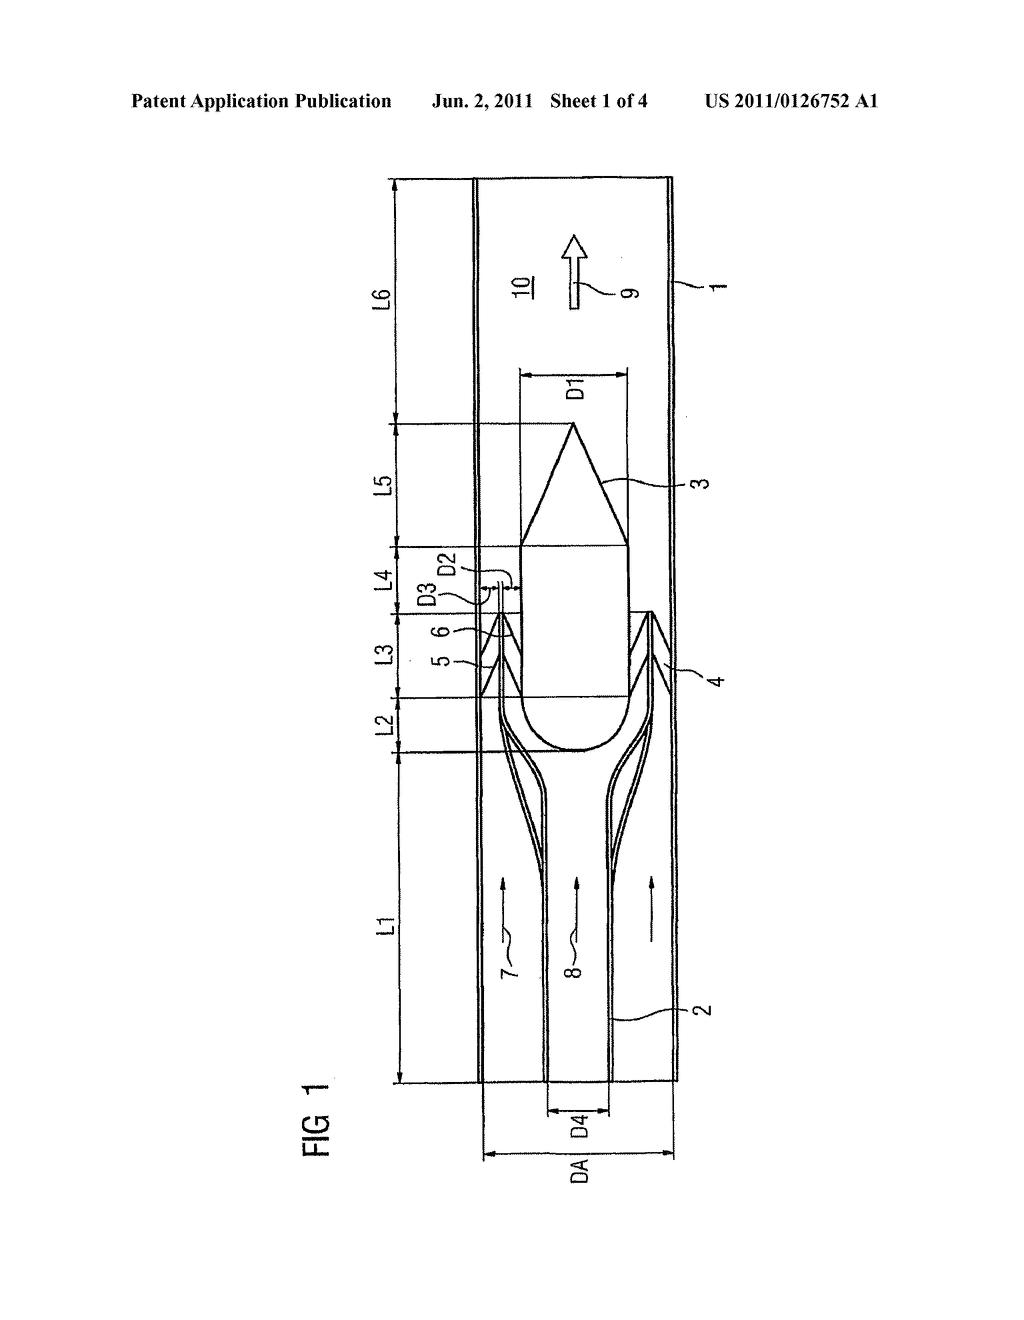 Submarine Schematic Diagram Trusted Schematics Power Steering With Underwater Exhaust Discharge During Snorkeling Mode